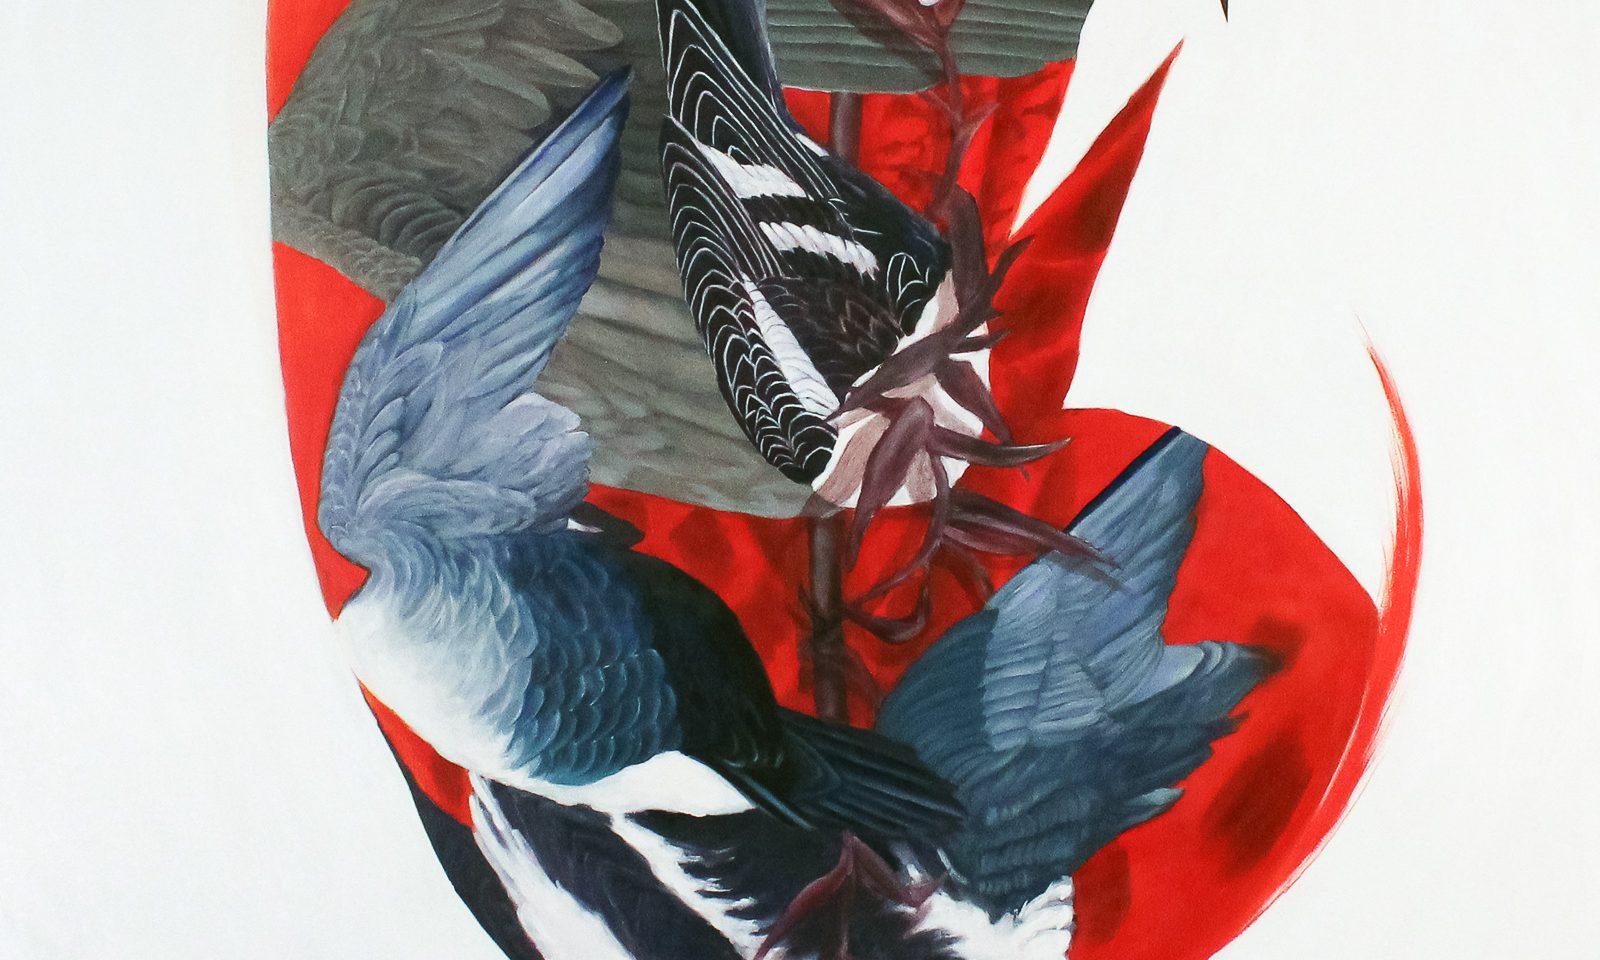 Ashley Perez, 2019 NALAC Fund for the Arts, San Antonio Artist Grantee